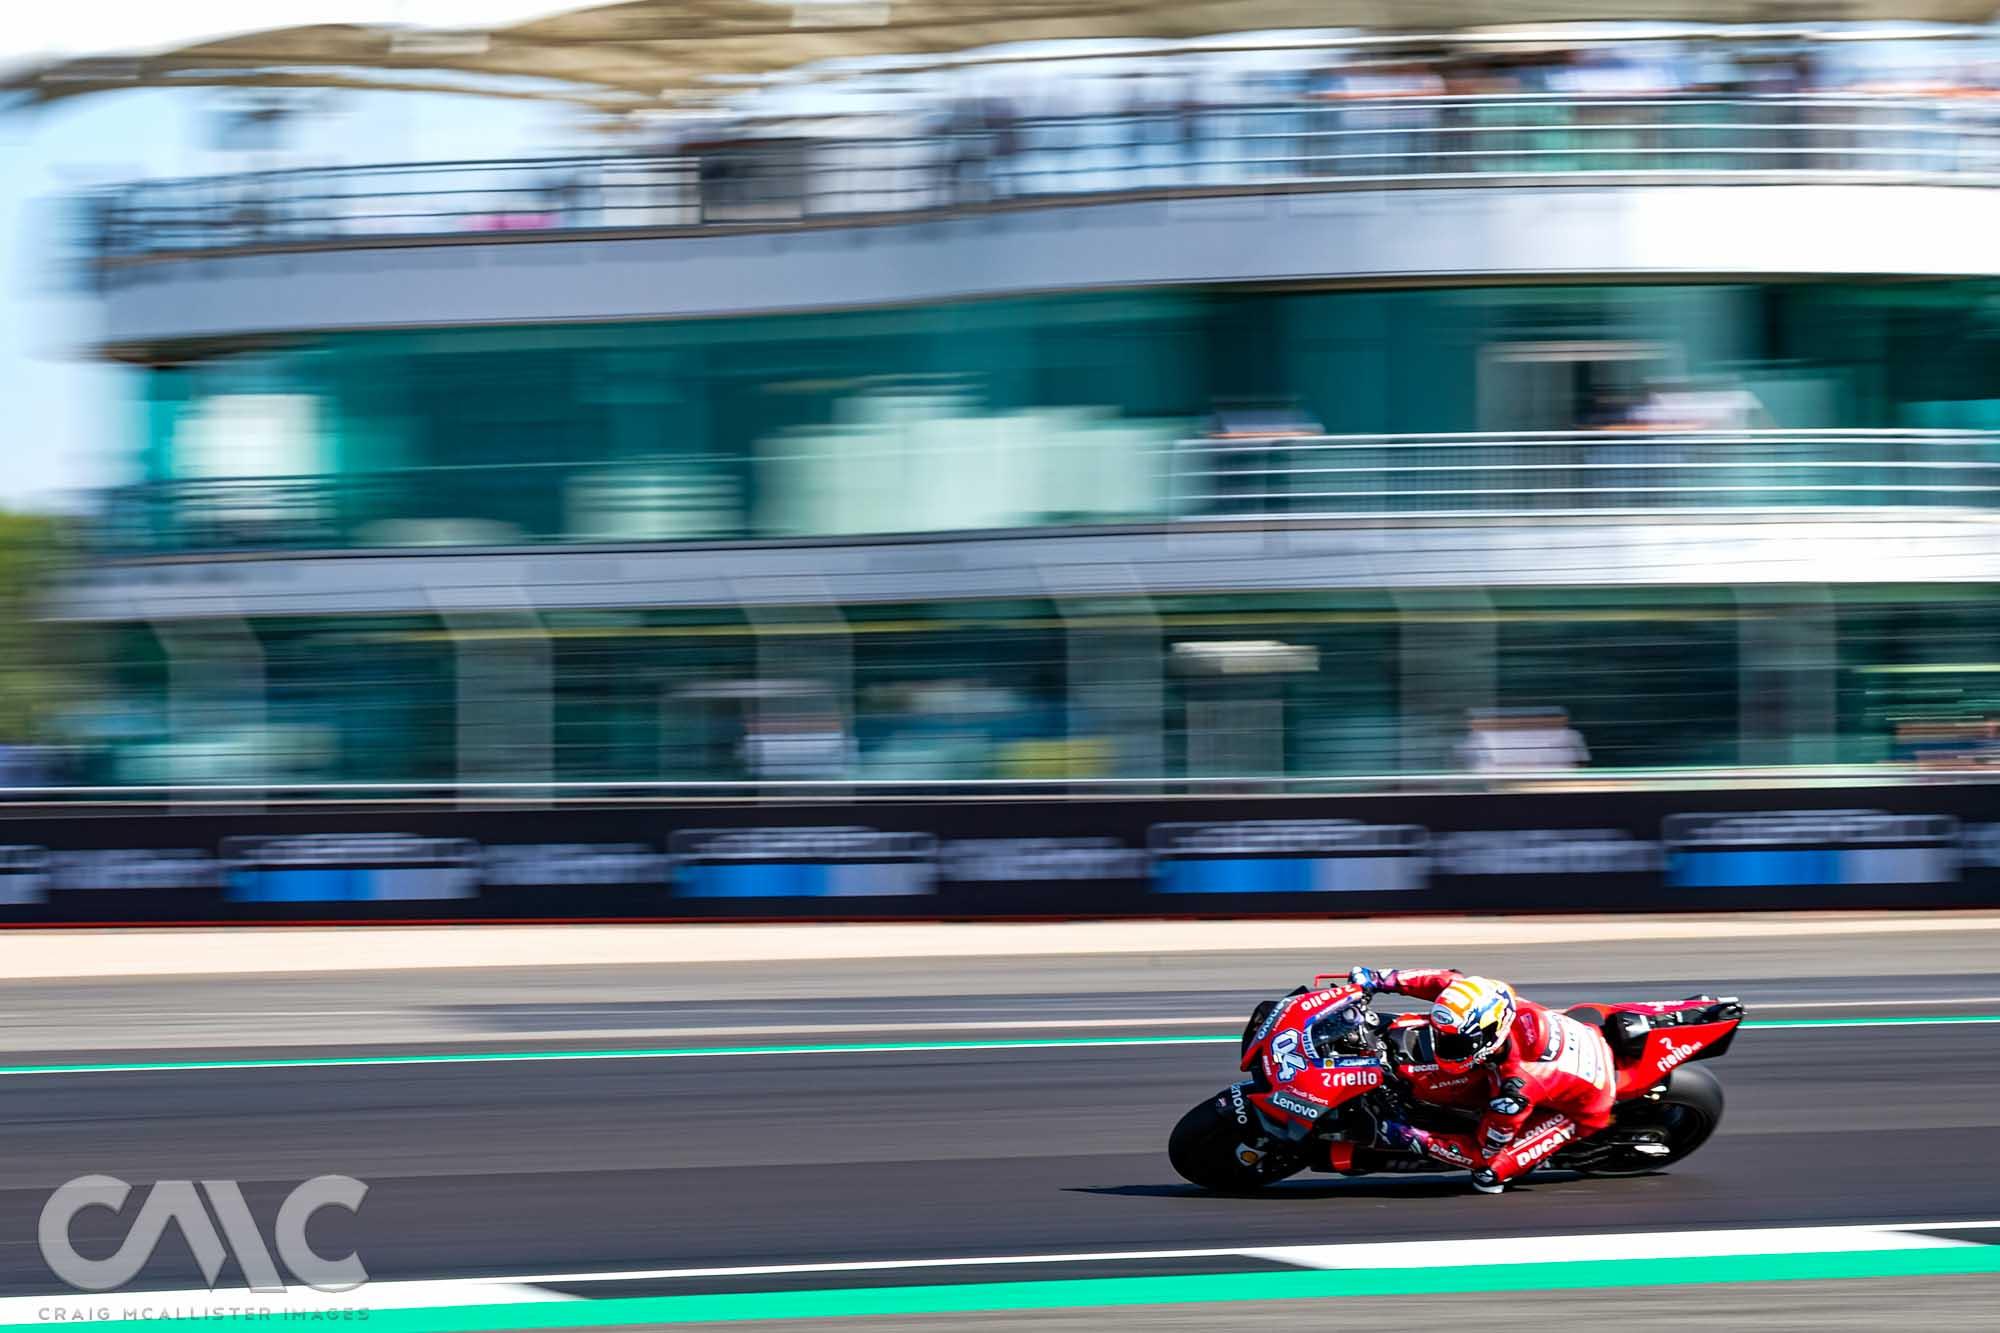 CMC_MotoGP_FP3_Silverstone 50-1404078.jpg